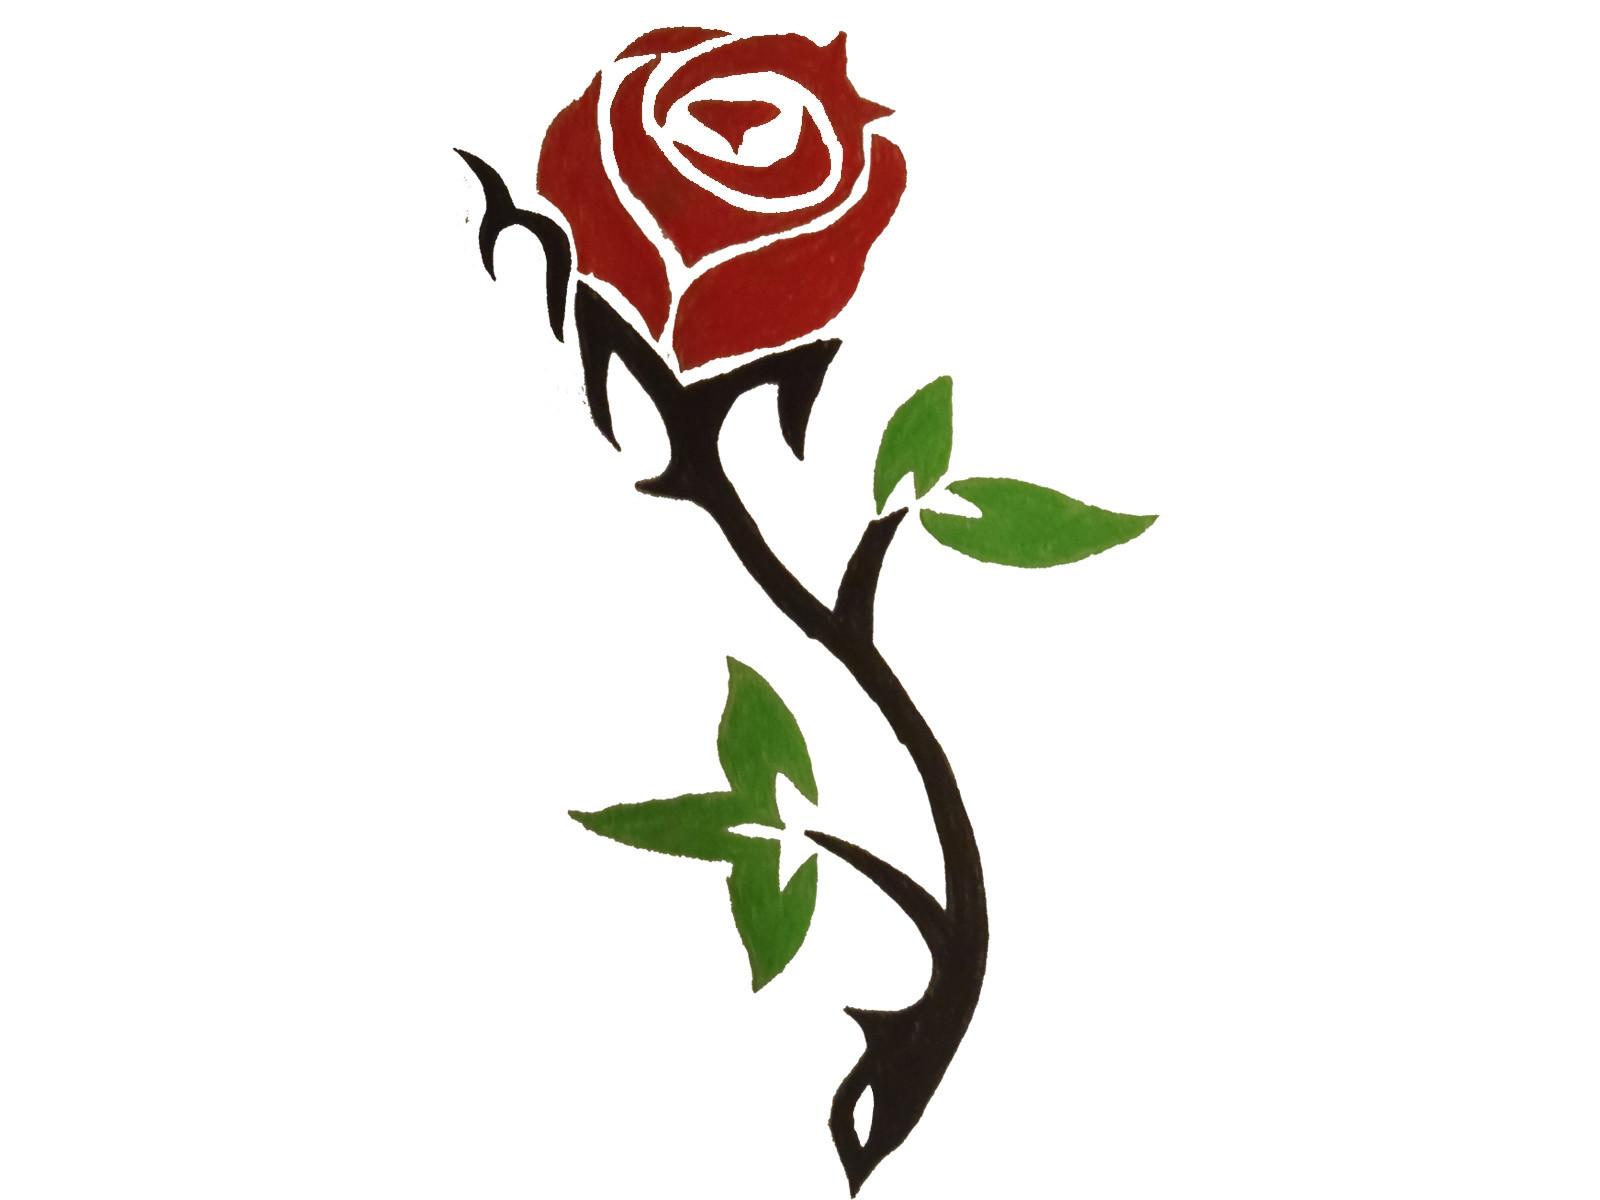 Simple Rose Designs - ClipArt Best - ClipArt Best